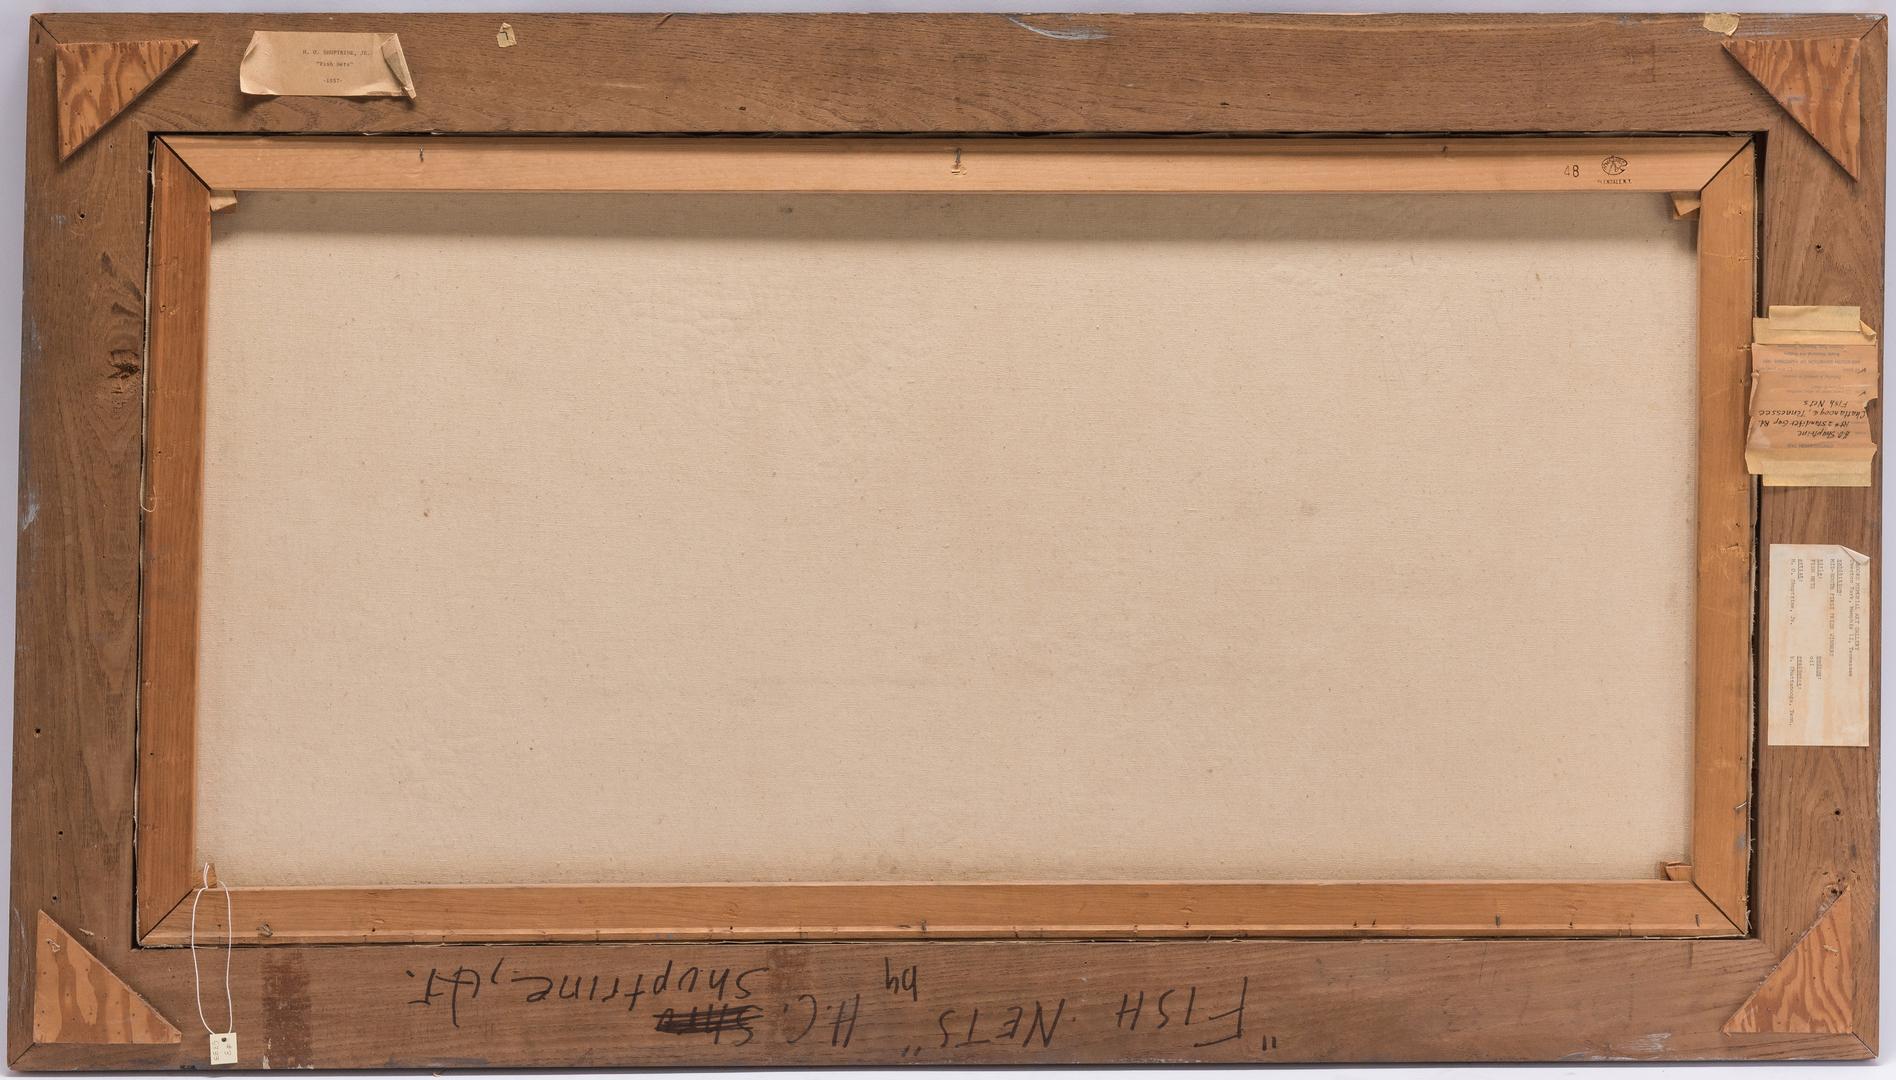 Lot 135: H. O. Shuptrine, Jr. O/C Abstract Painting, Fish Nets